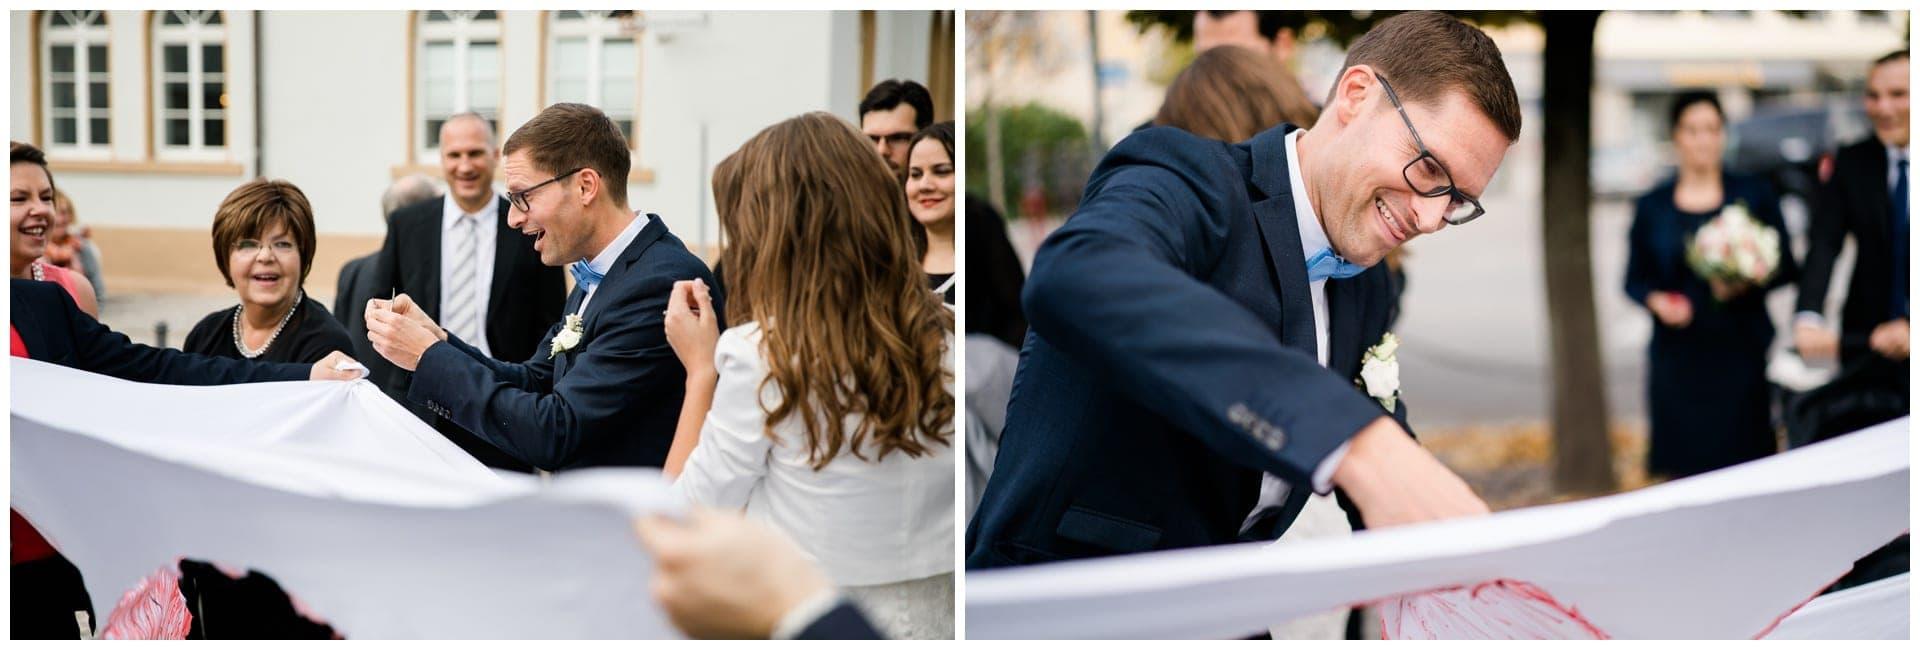 Caroline und Andreas @mama wedding 37